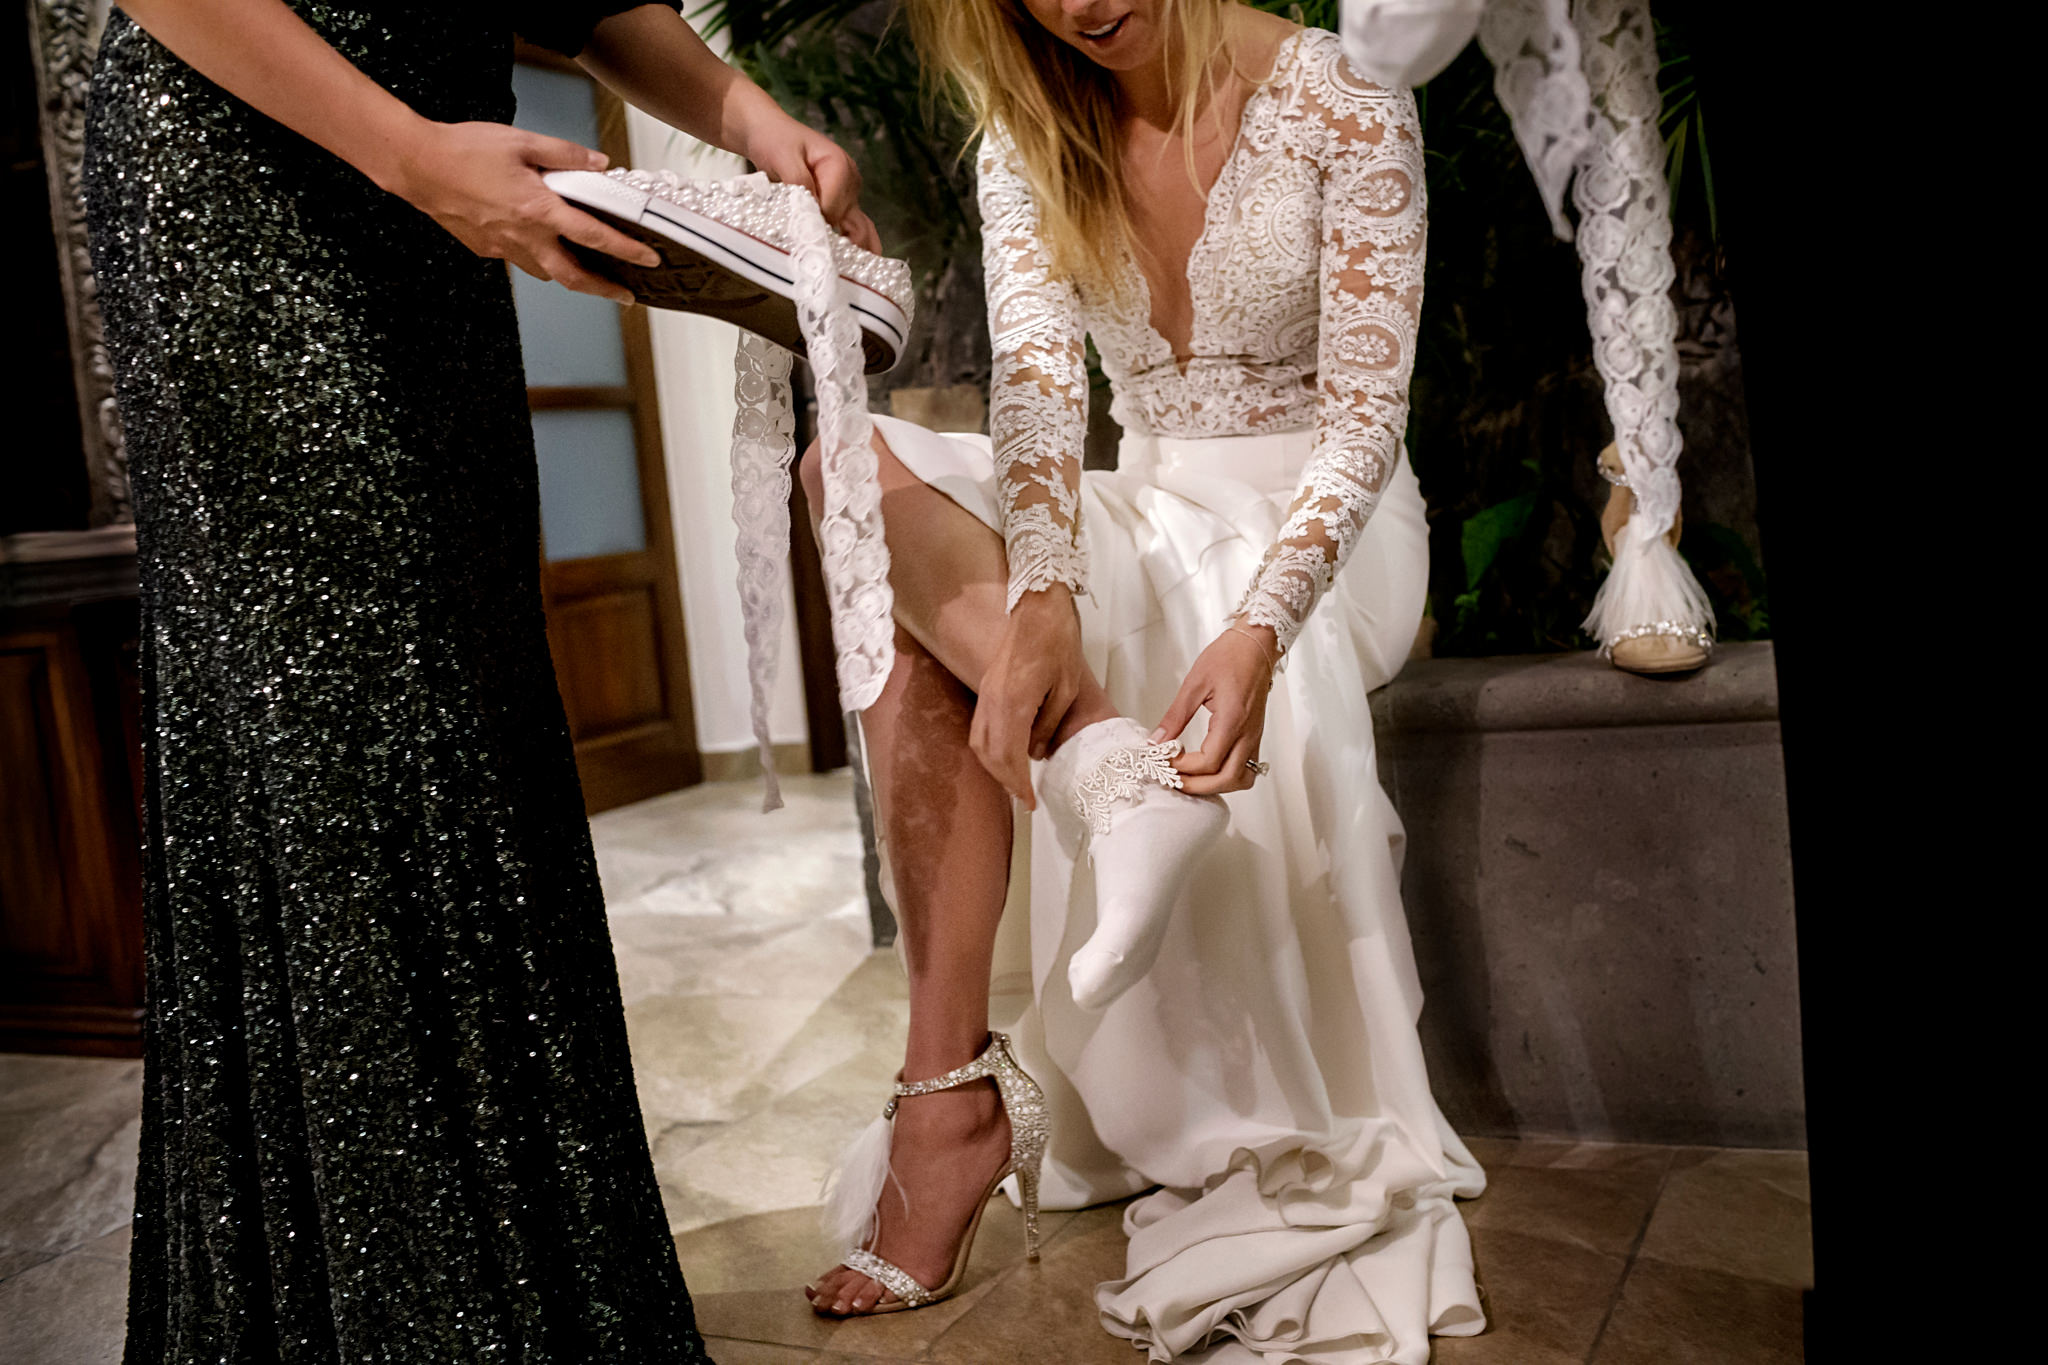 Krystal and David's wedding at Rosewood in San Miguel de Allende, Mexico.